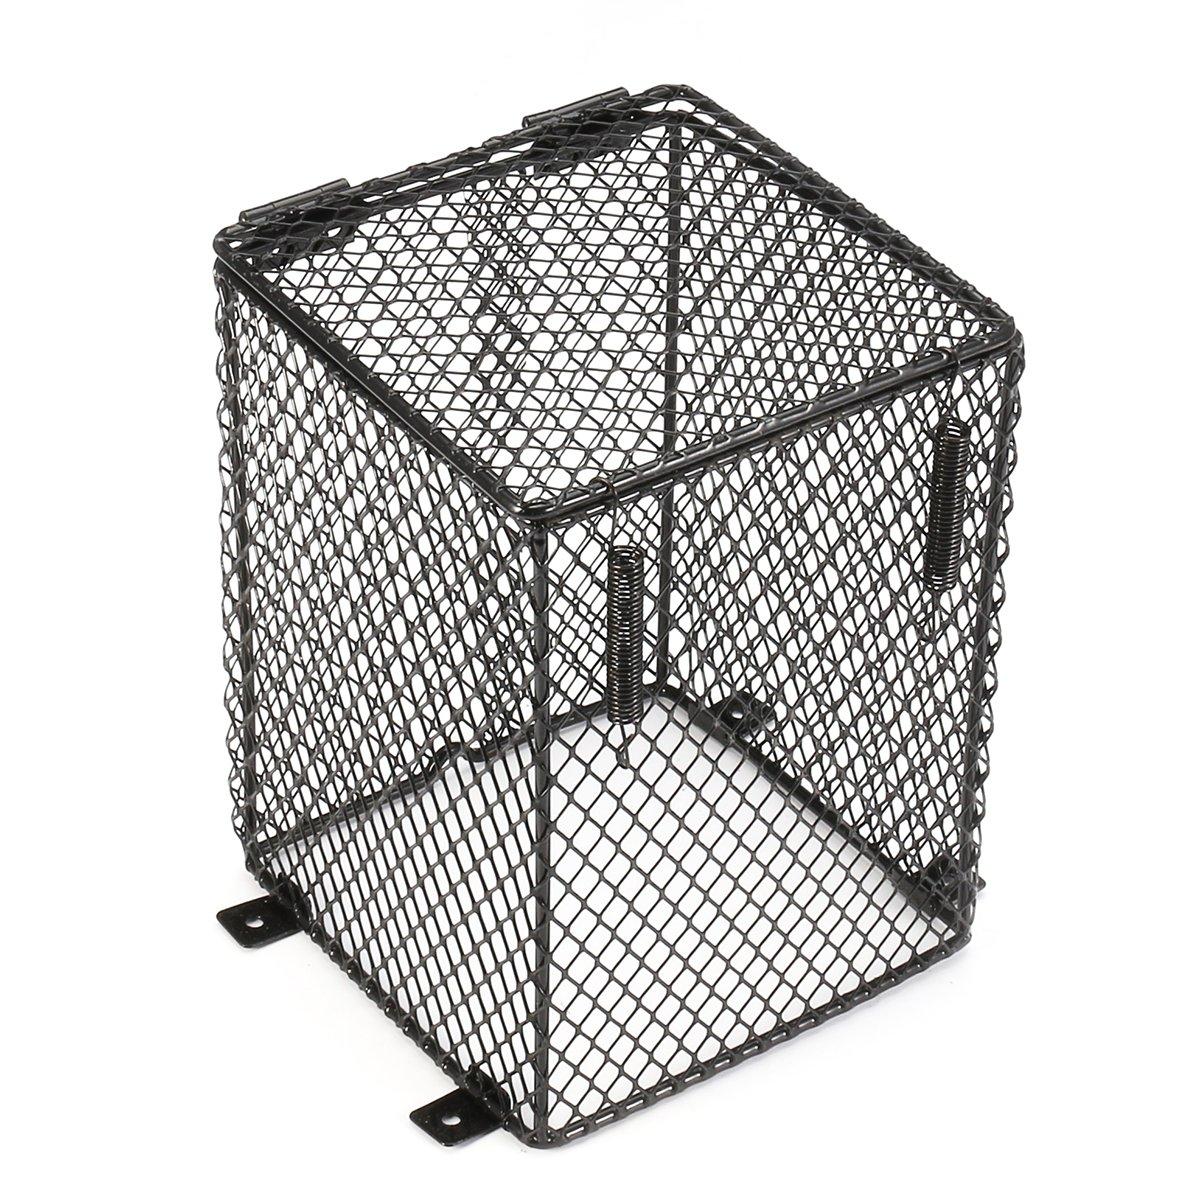 QOJA reptile basking lamp guard mesh cage light bulb protector